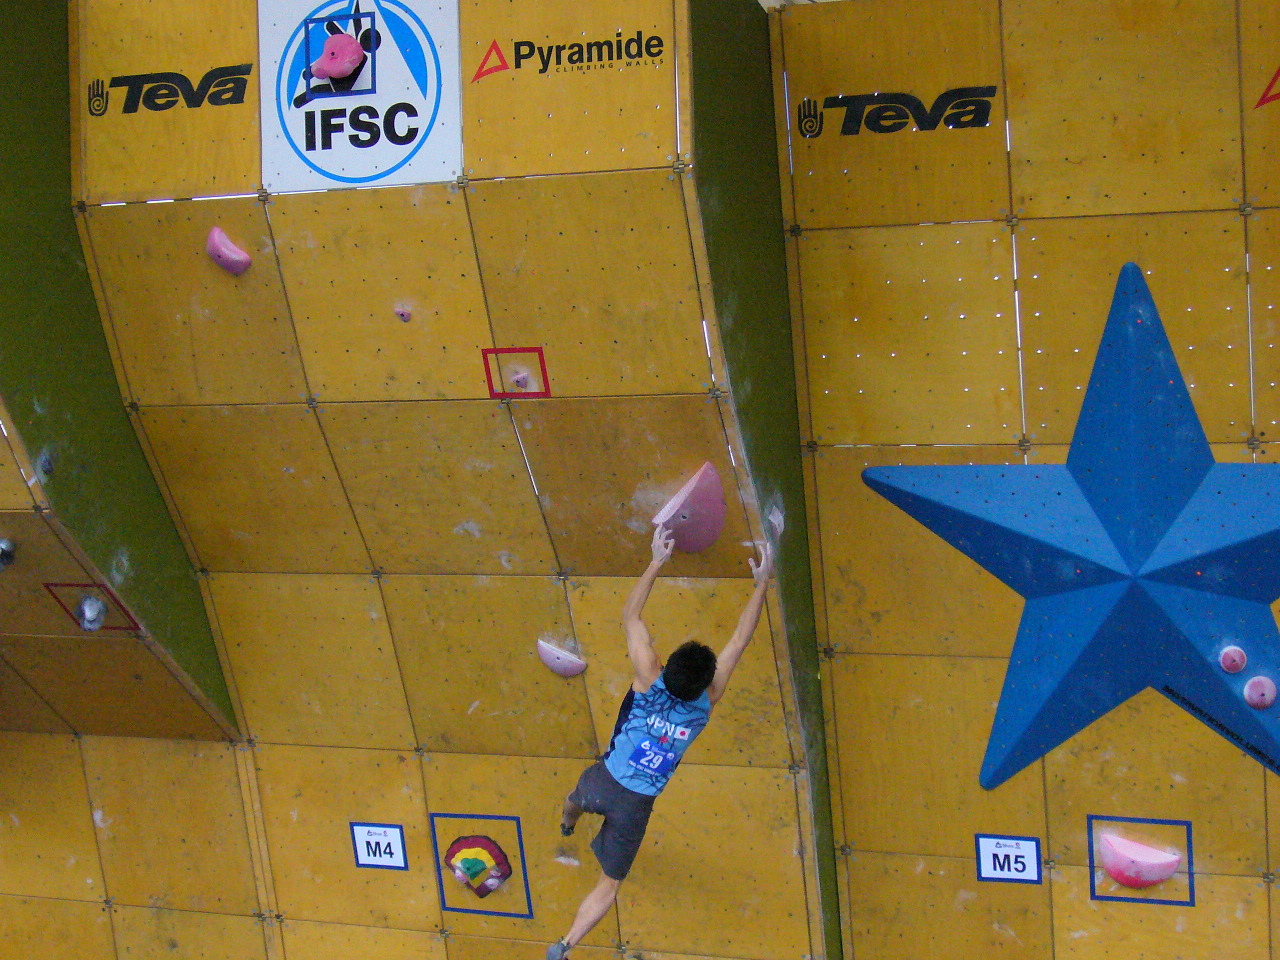 boulder world cup in vail u.s.a_d0131371_11212384.jpg